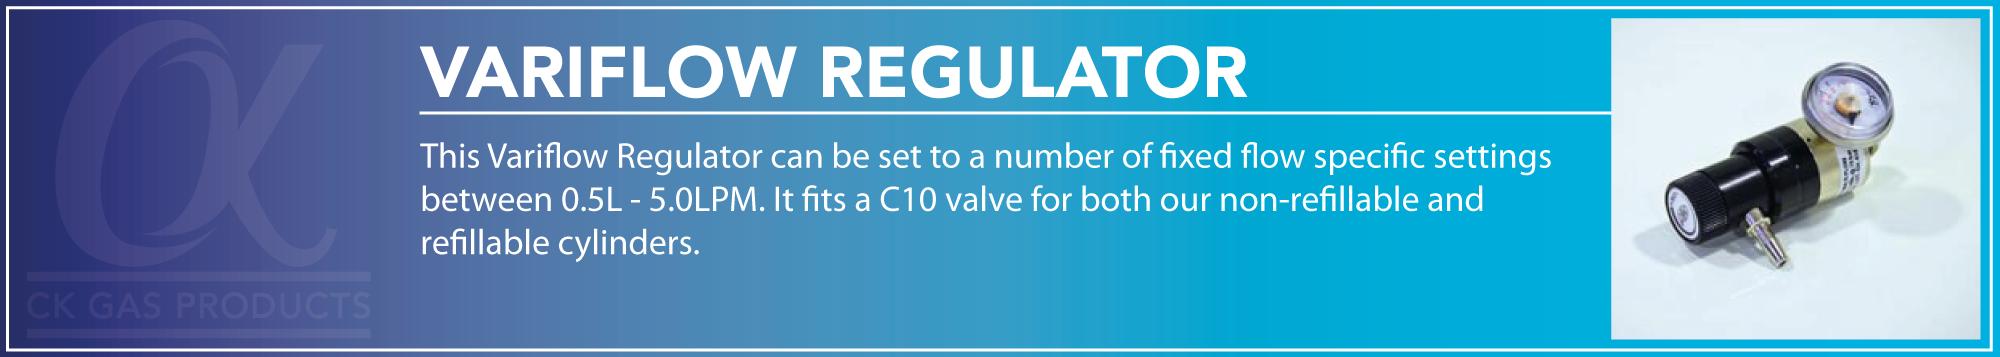 Variflow_Regulator